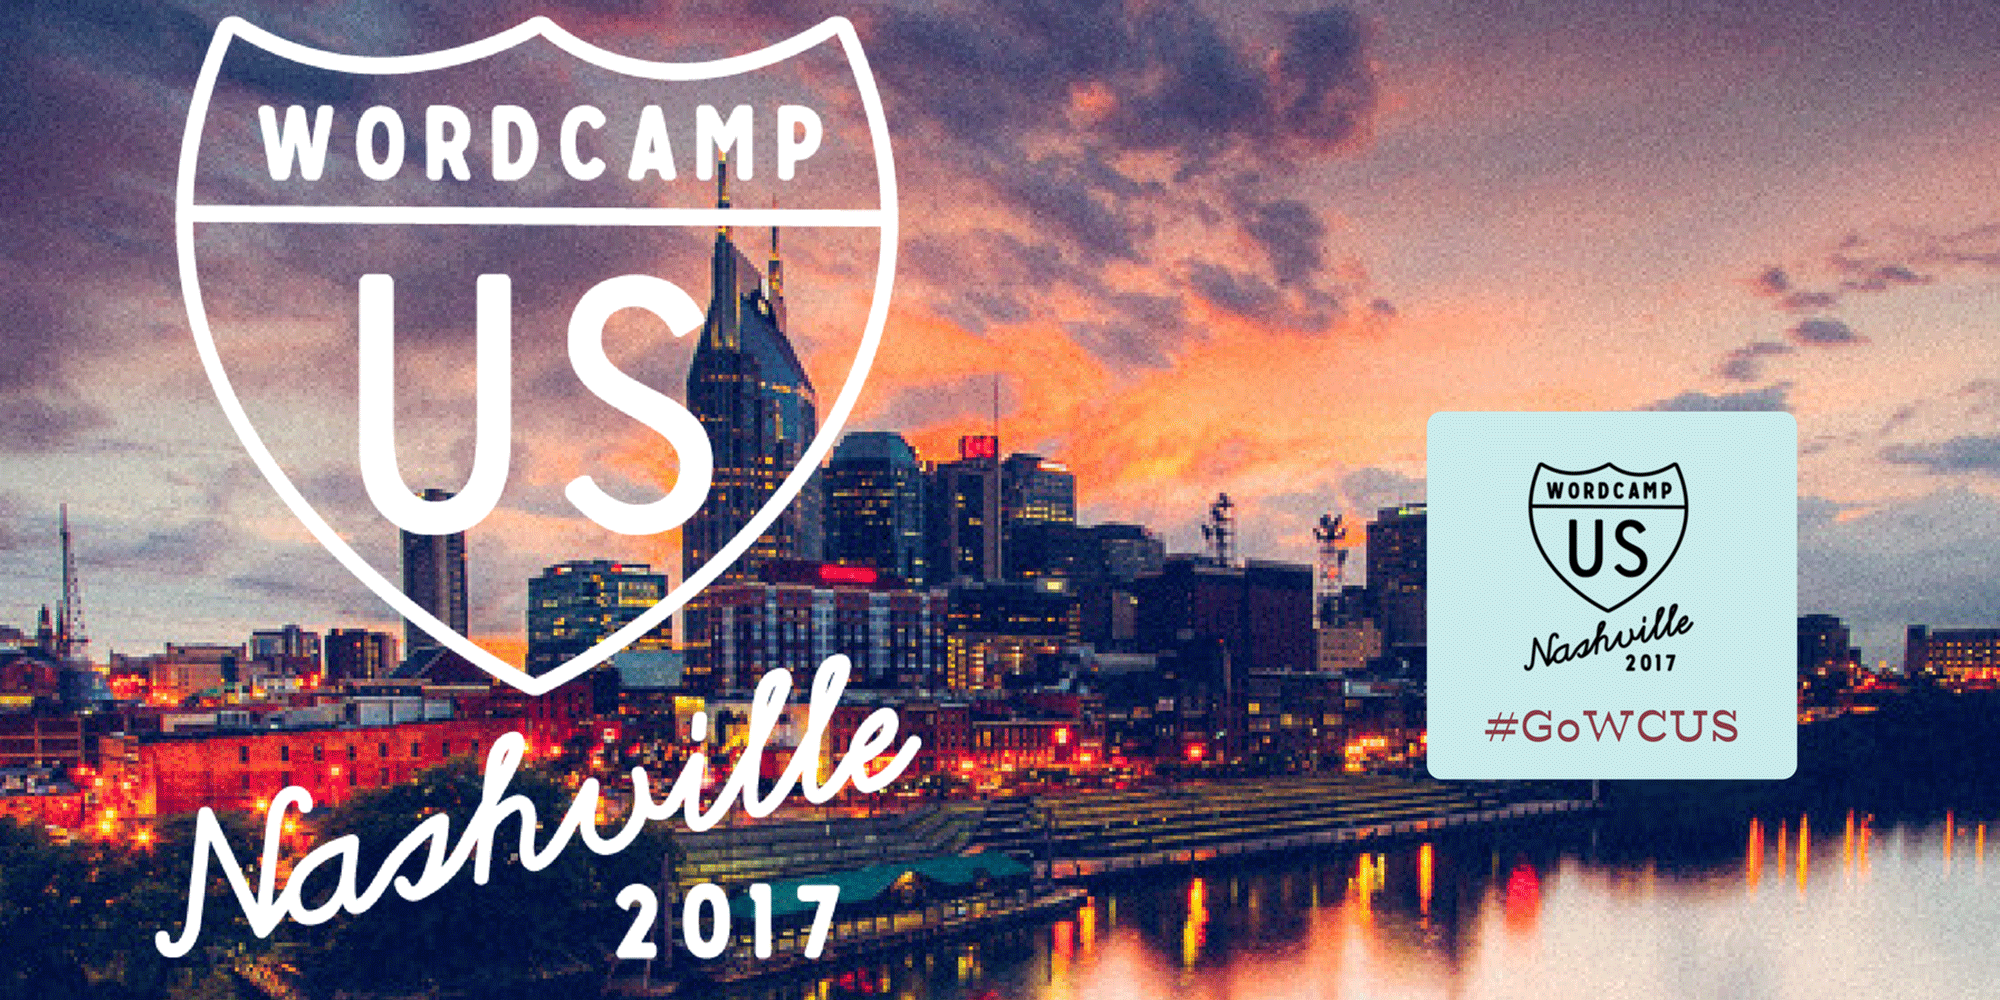 WordCamp US 2017, WordCamp US Nashville 2017